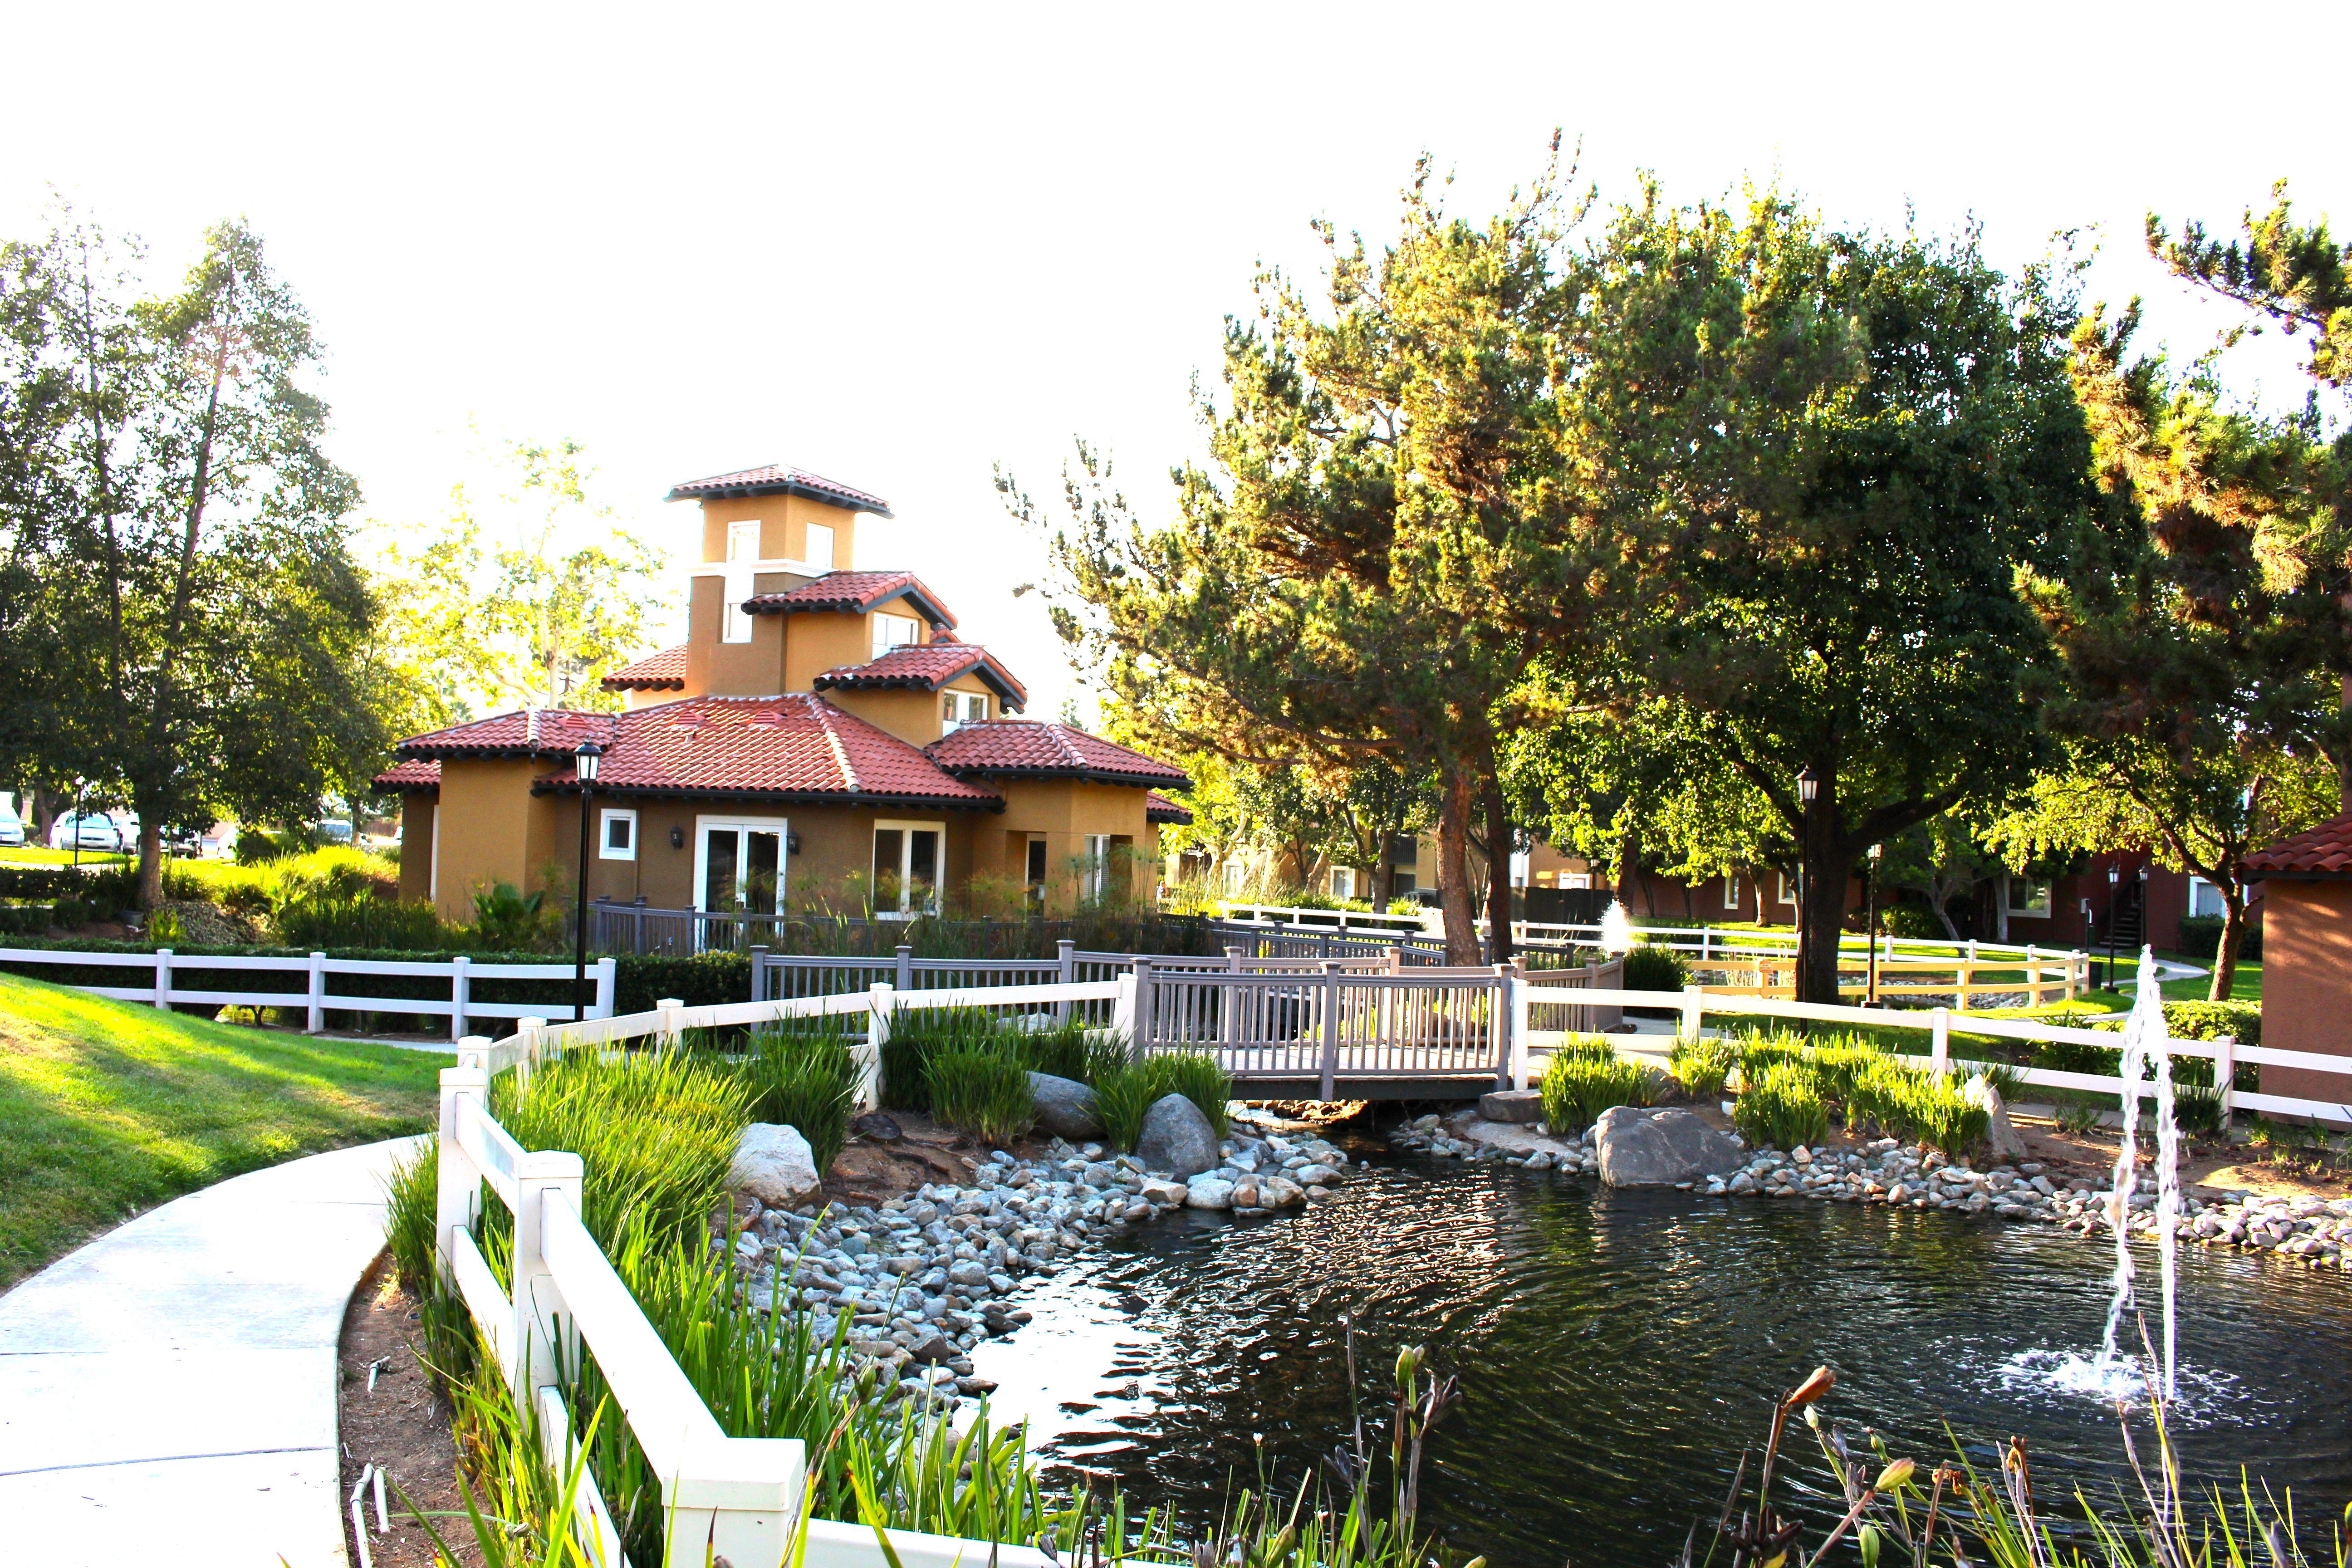 rancho bernardo apartments - best apartment of all time